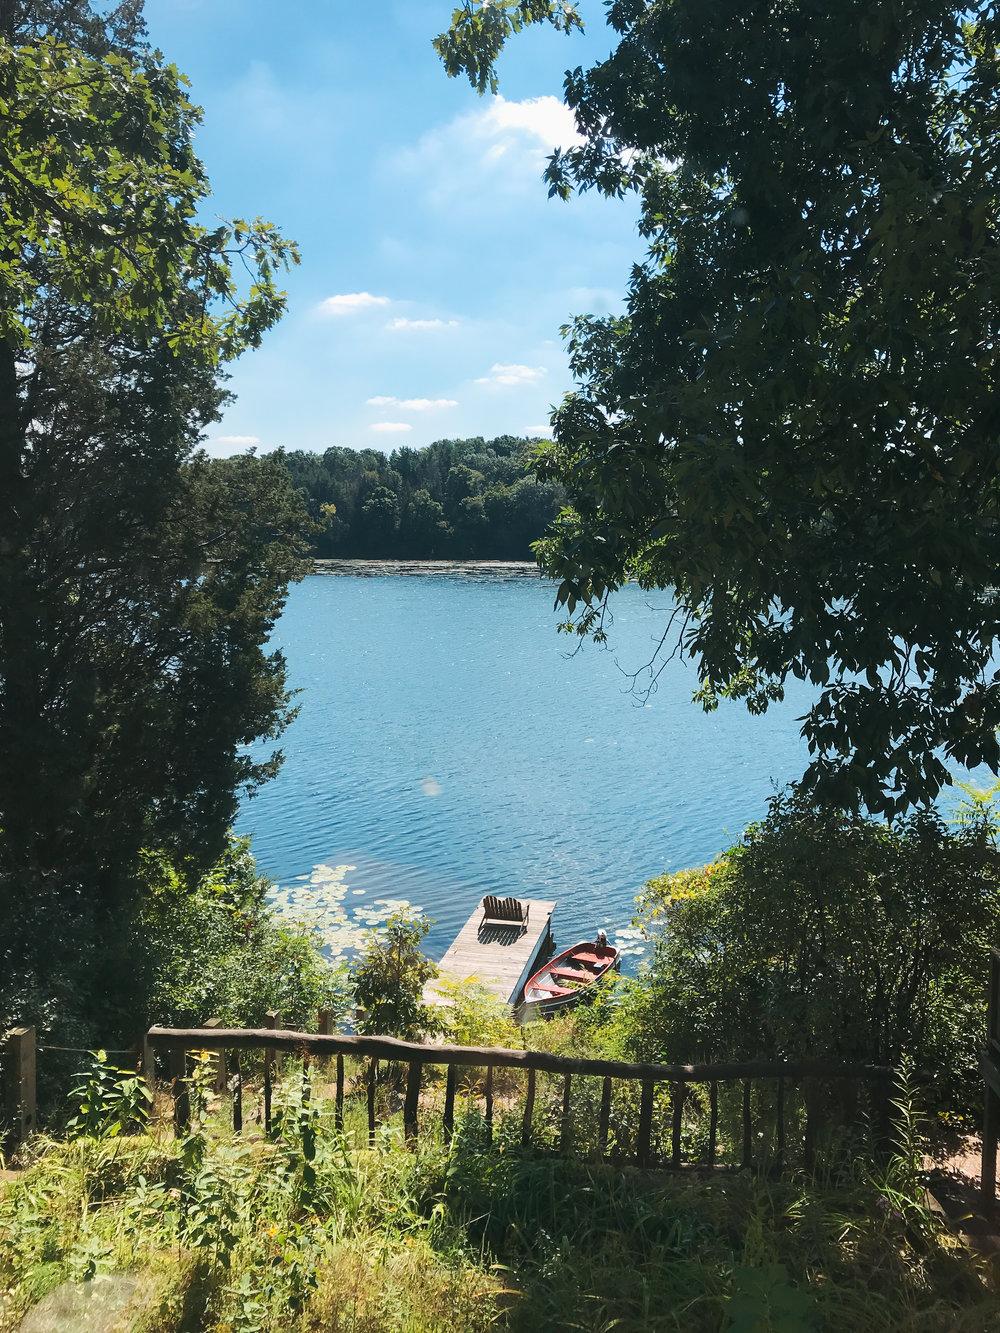 wandawega_water_dock_boat_camp.jpg